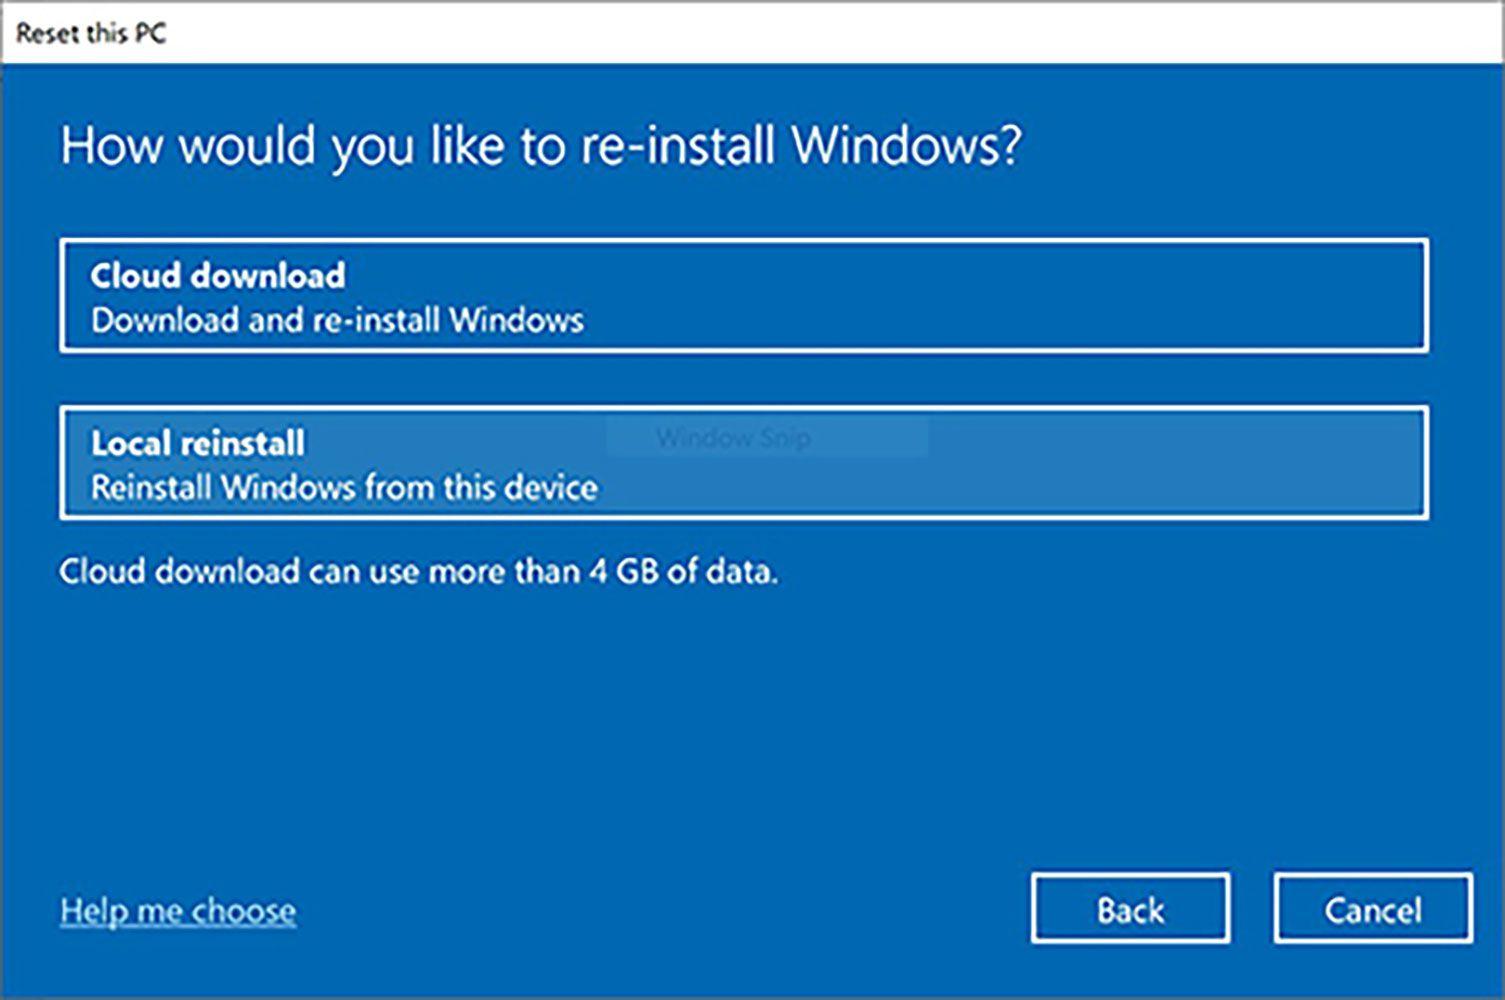 Windows reinstall options